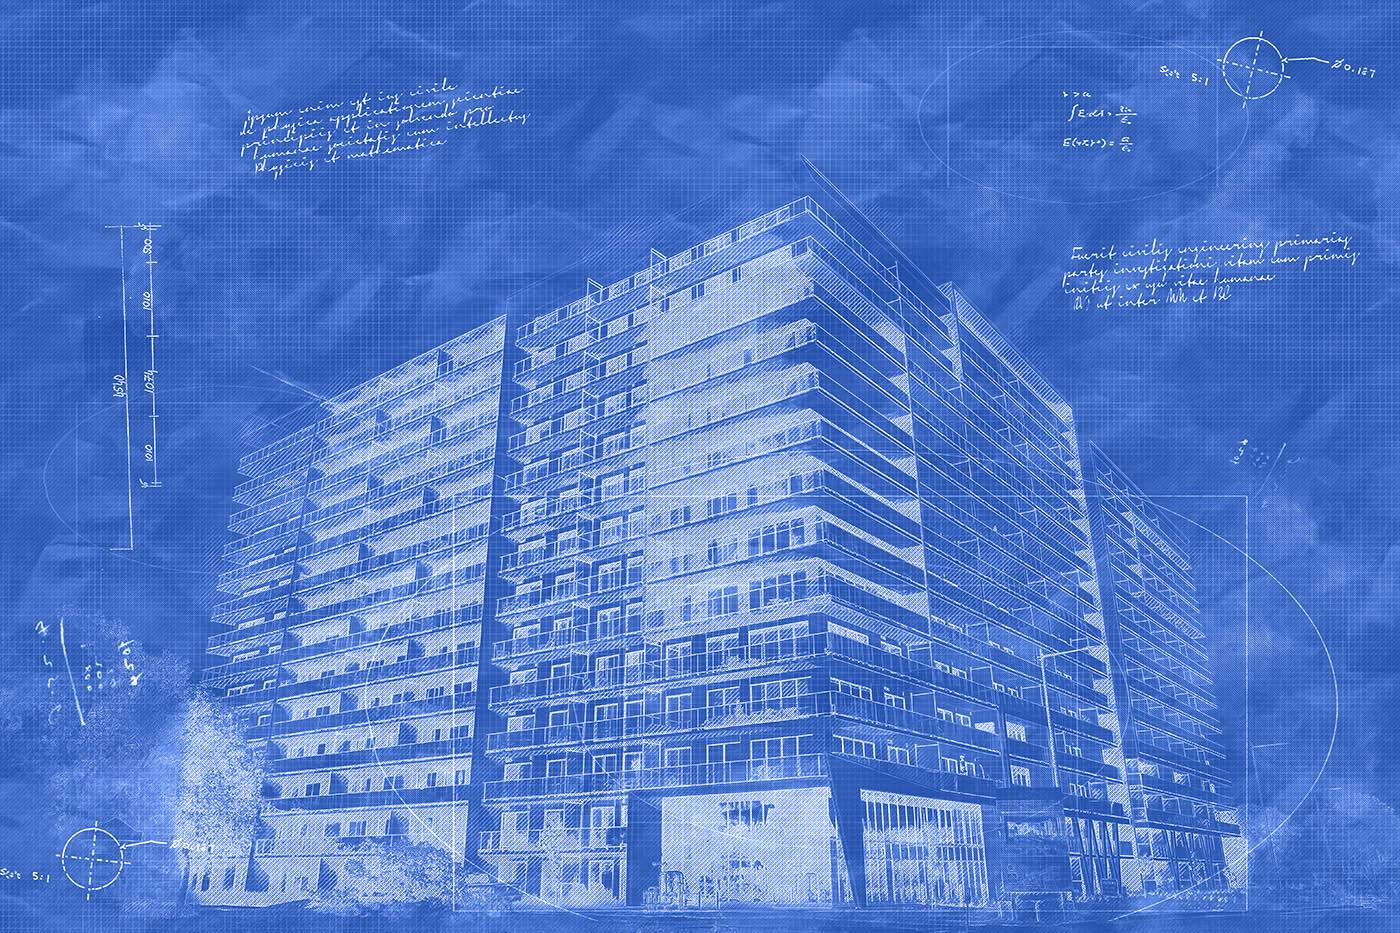 Large Condominium Building Sketch Blueprint Image - Stock Photo